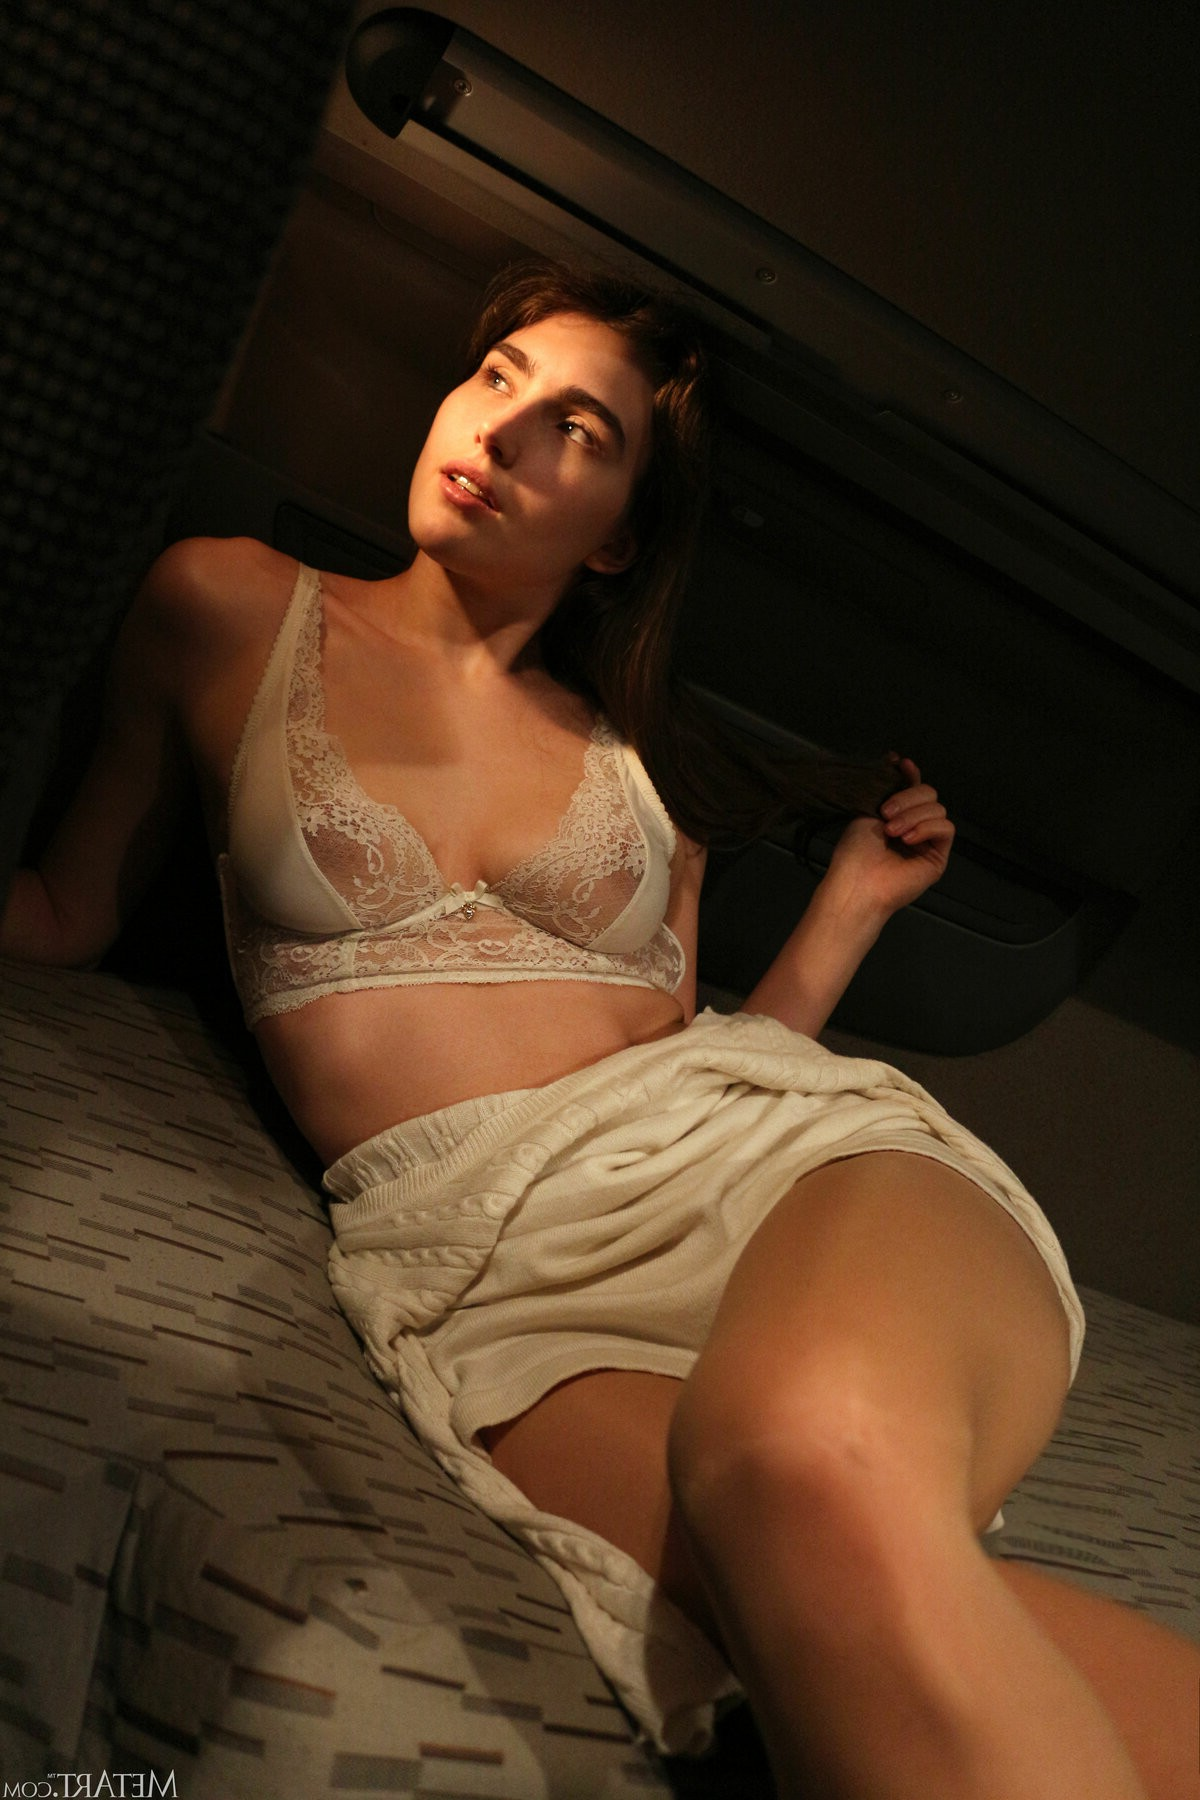 massatge erotico.miley